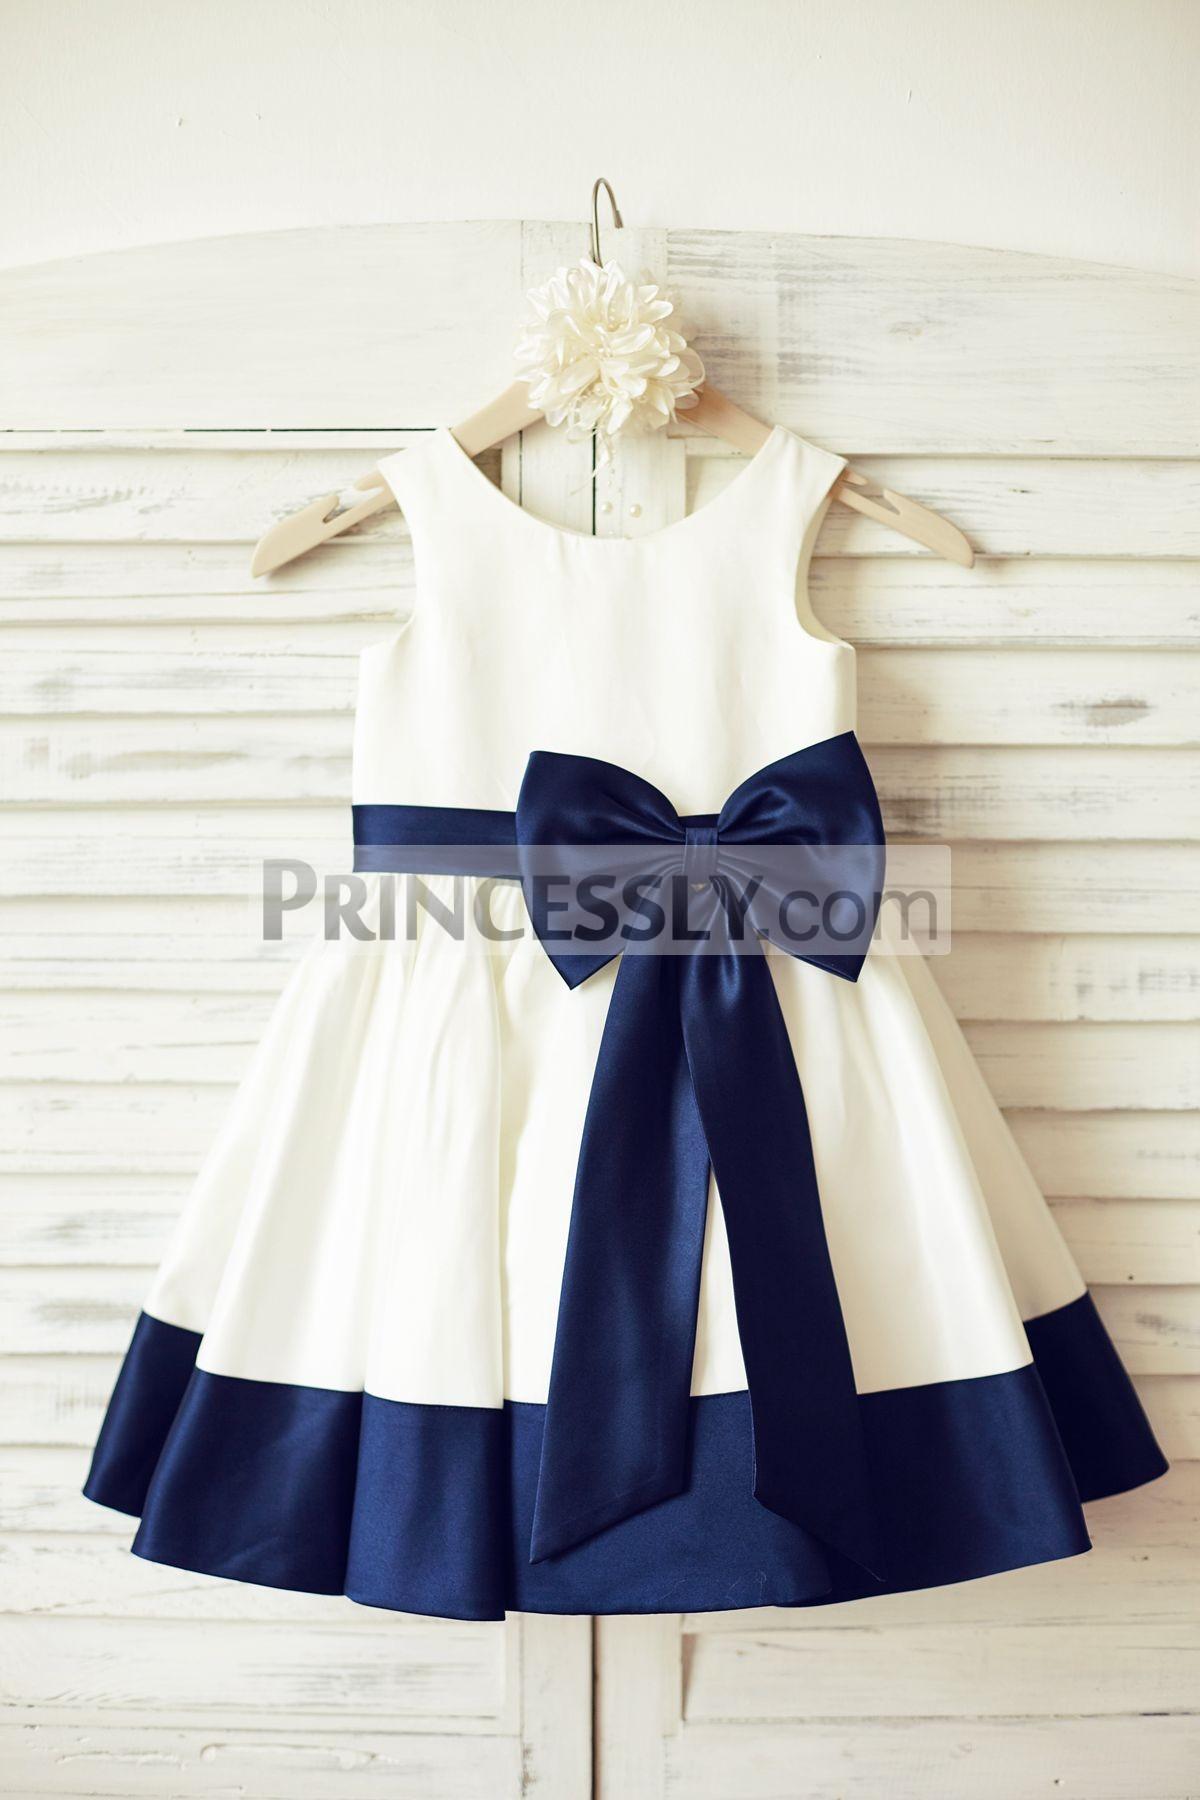 Ivory Satin Sleeveless Flower Girl Dress With Navy Blue